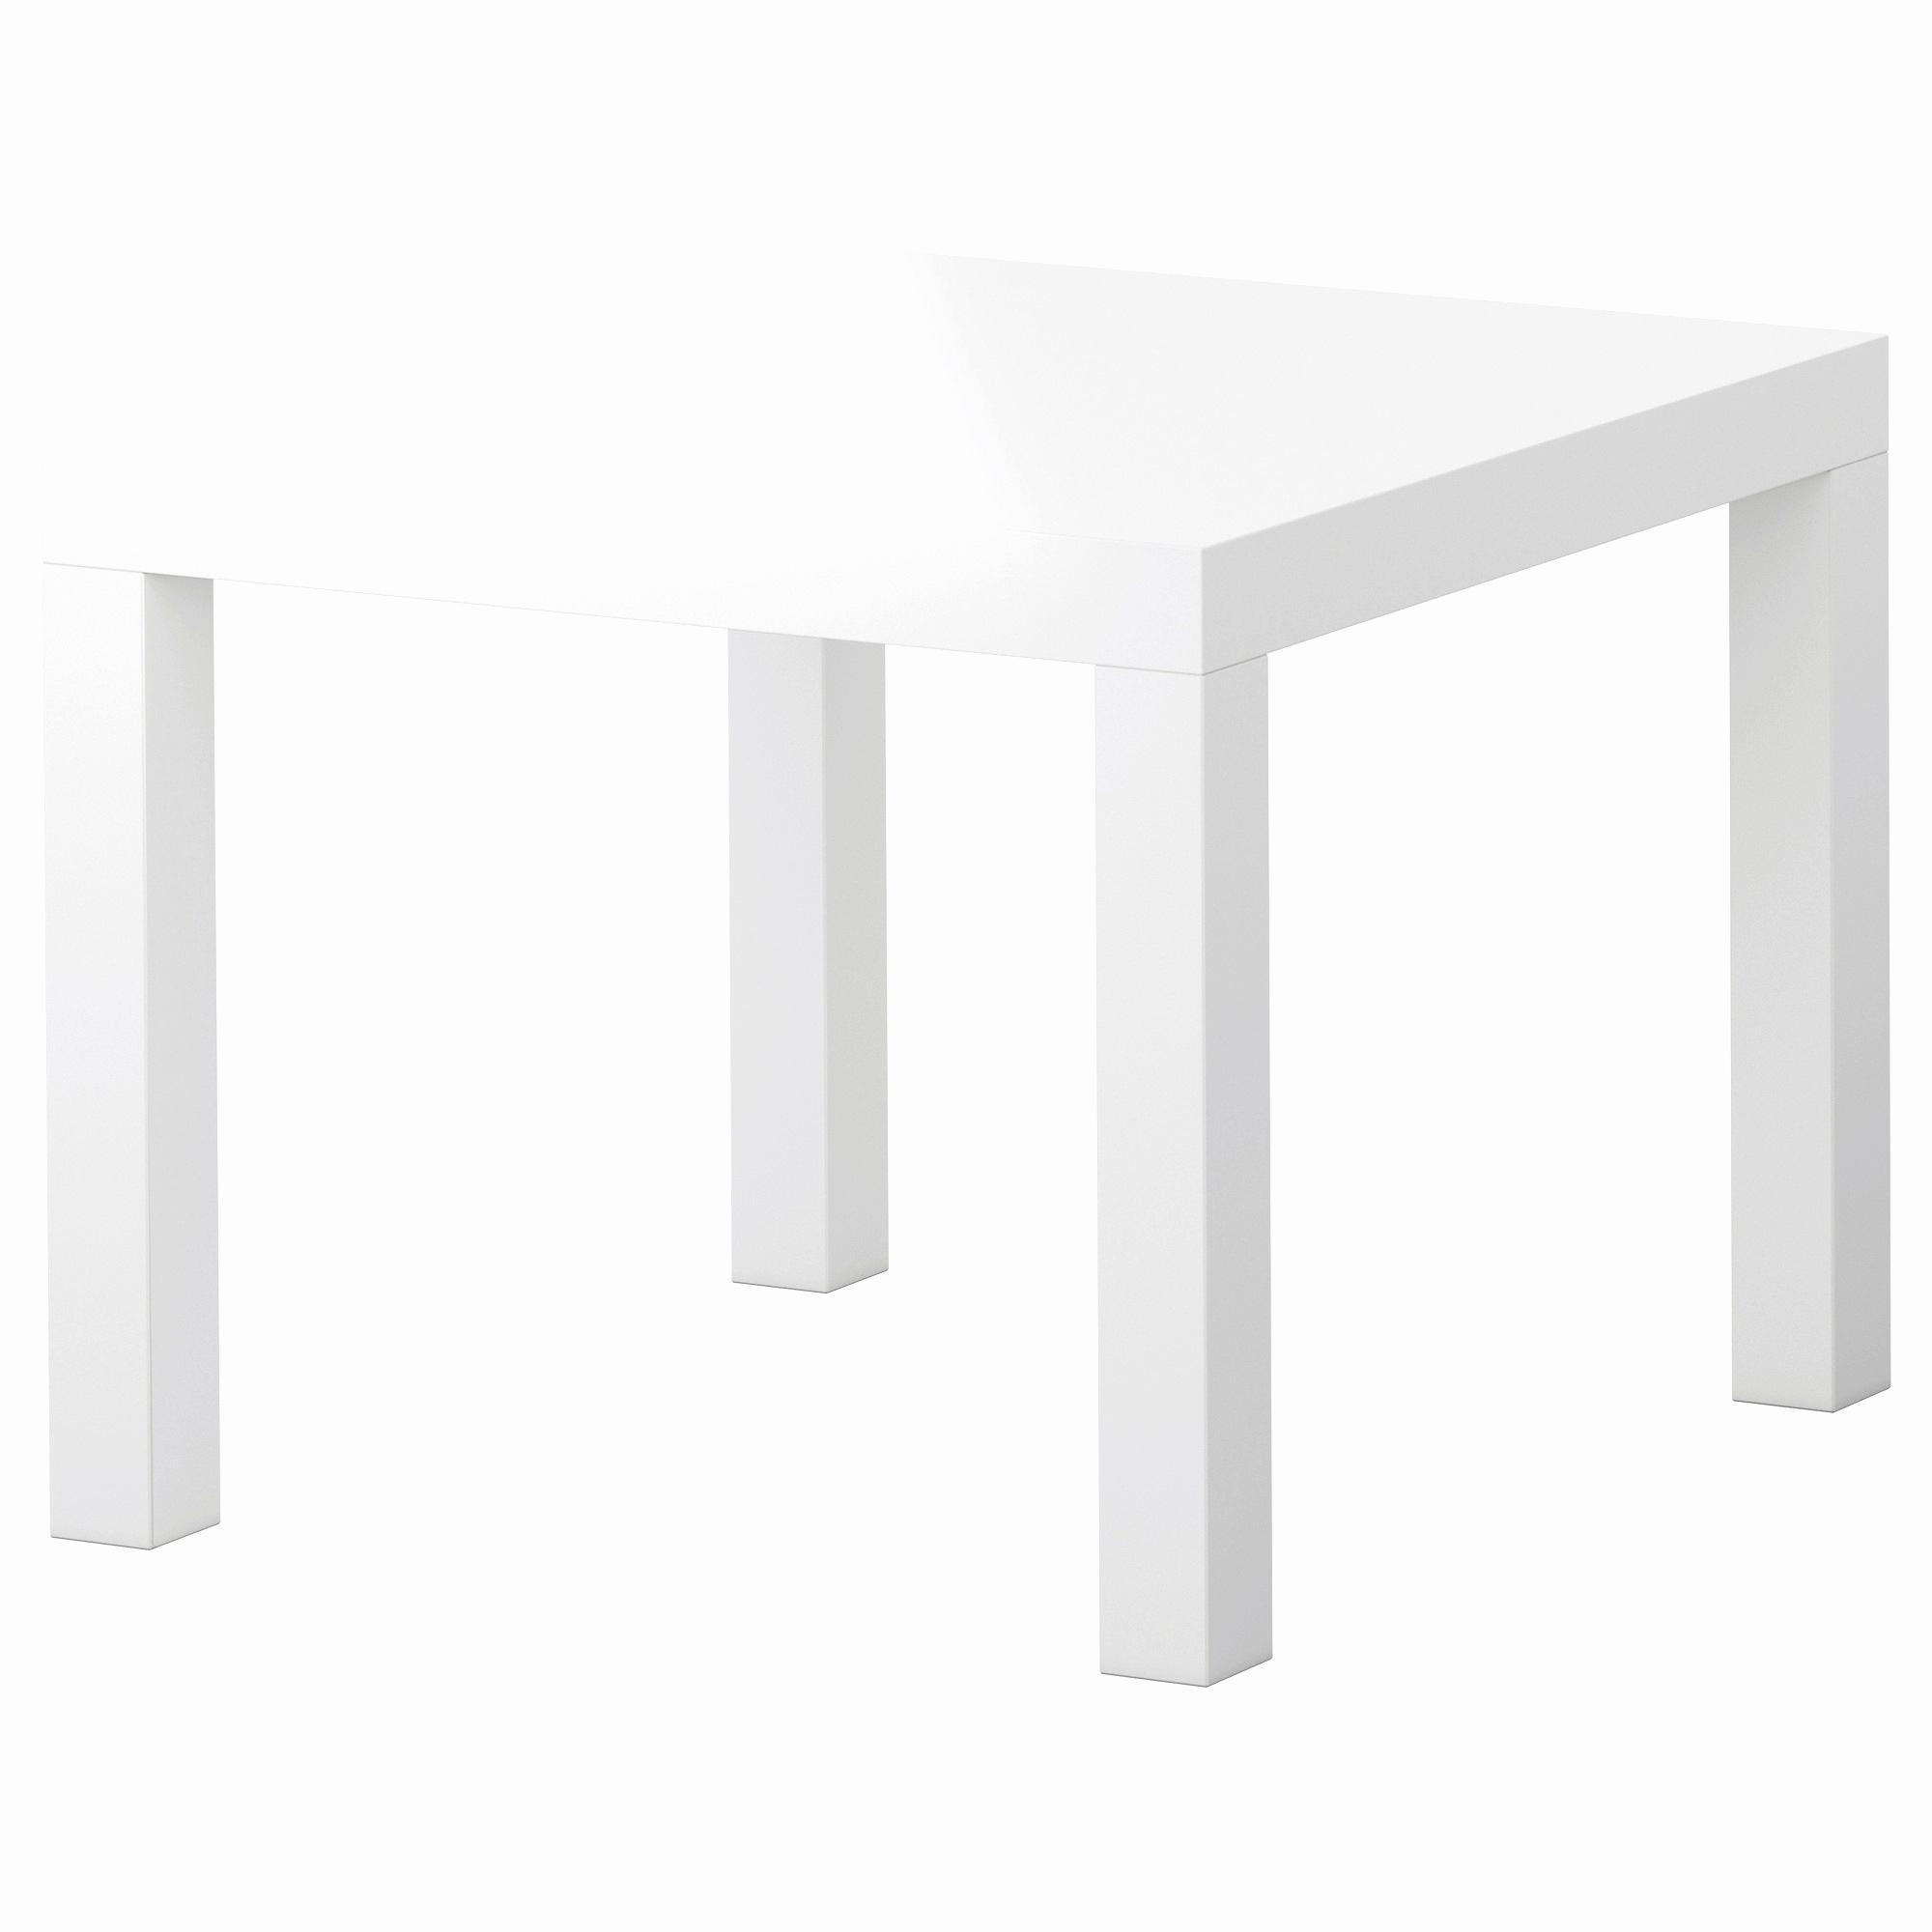 table de jardin alinea luxe table basse relevable extensible ikea nouveau tables de jardin table of table de jardin alinea